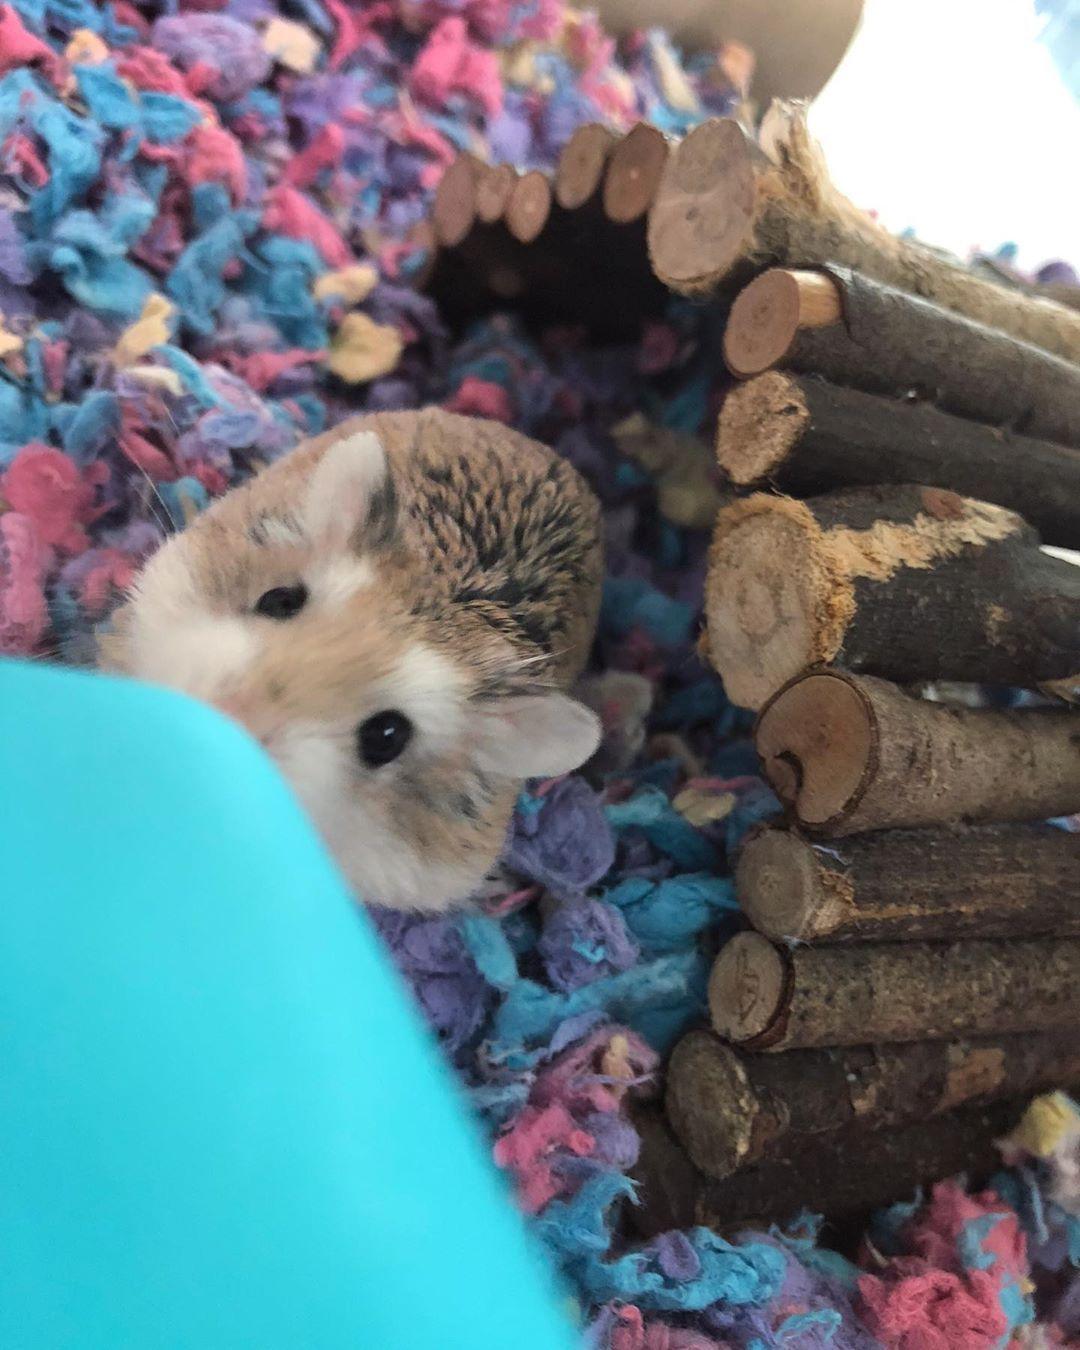 Bbw hamster movies